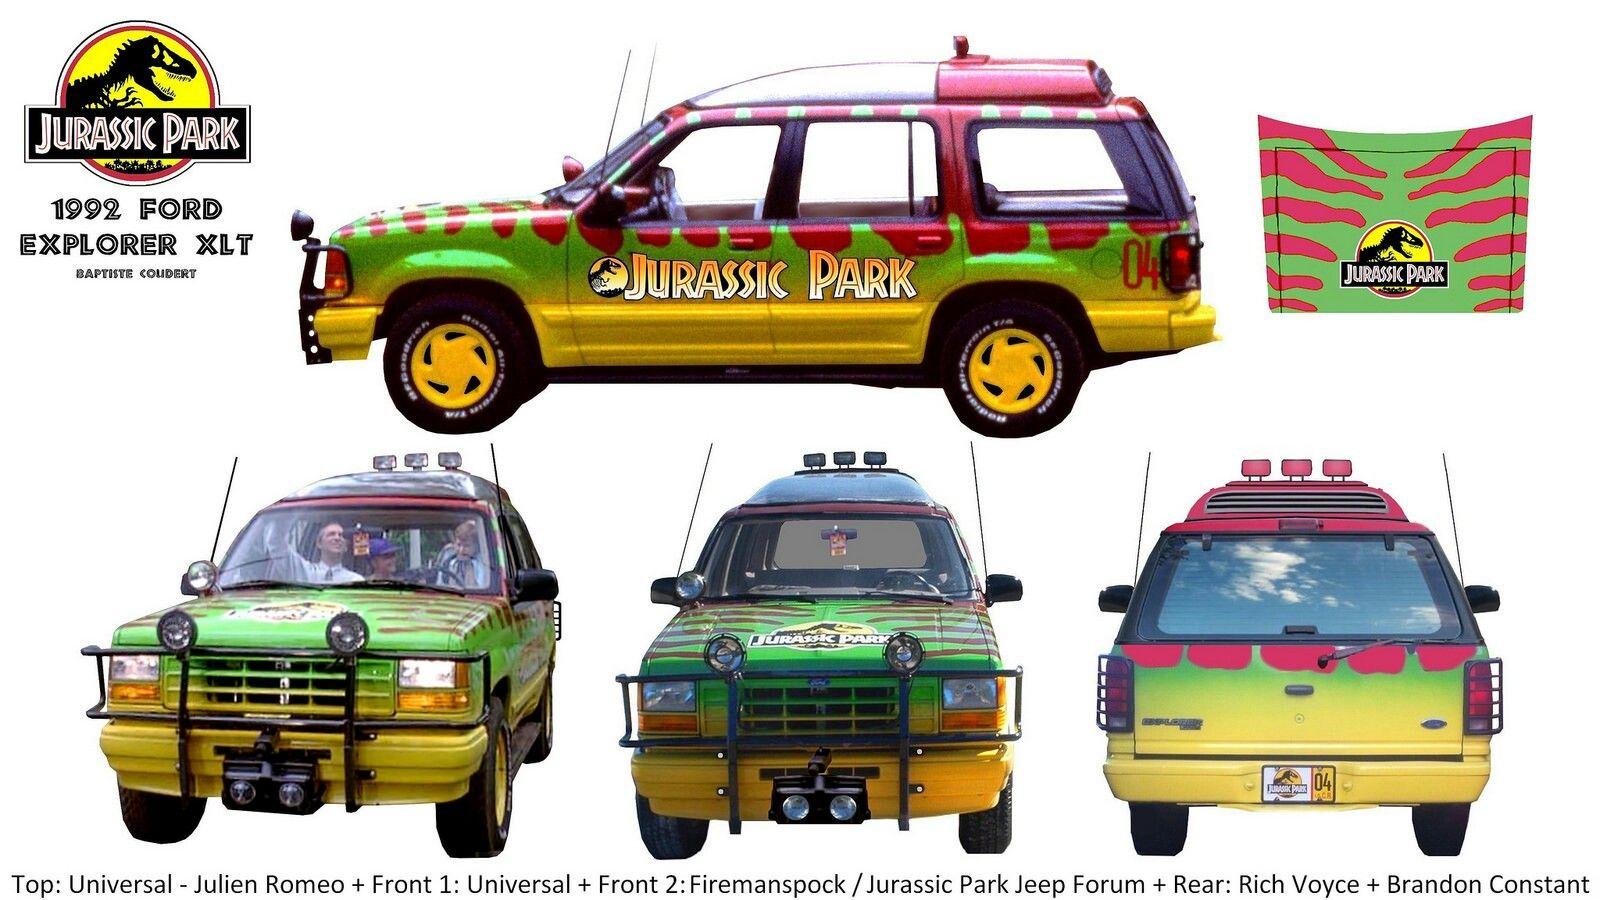 Pin By Unheardbonzai17 On Jurassic Park Jurassic Park Car Jurassic Park Toys Jurassic Park Jeep